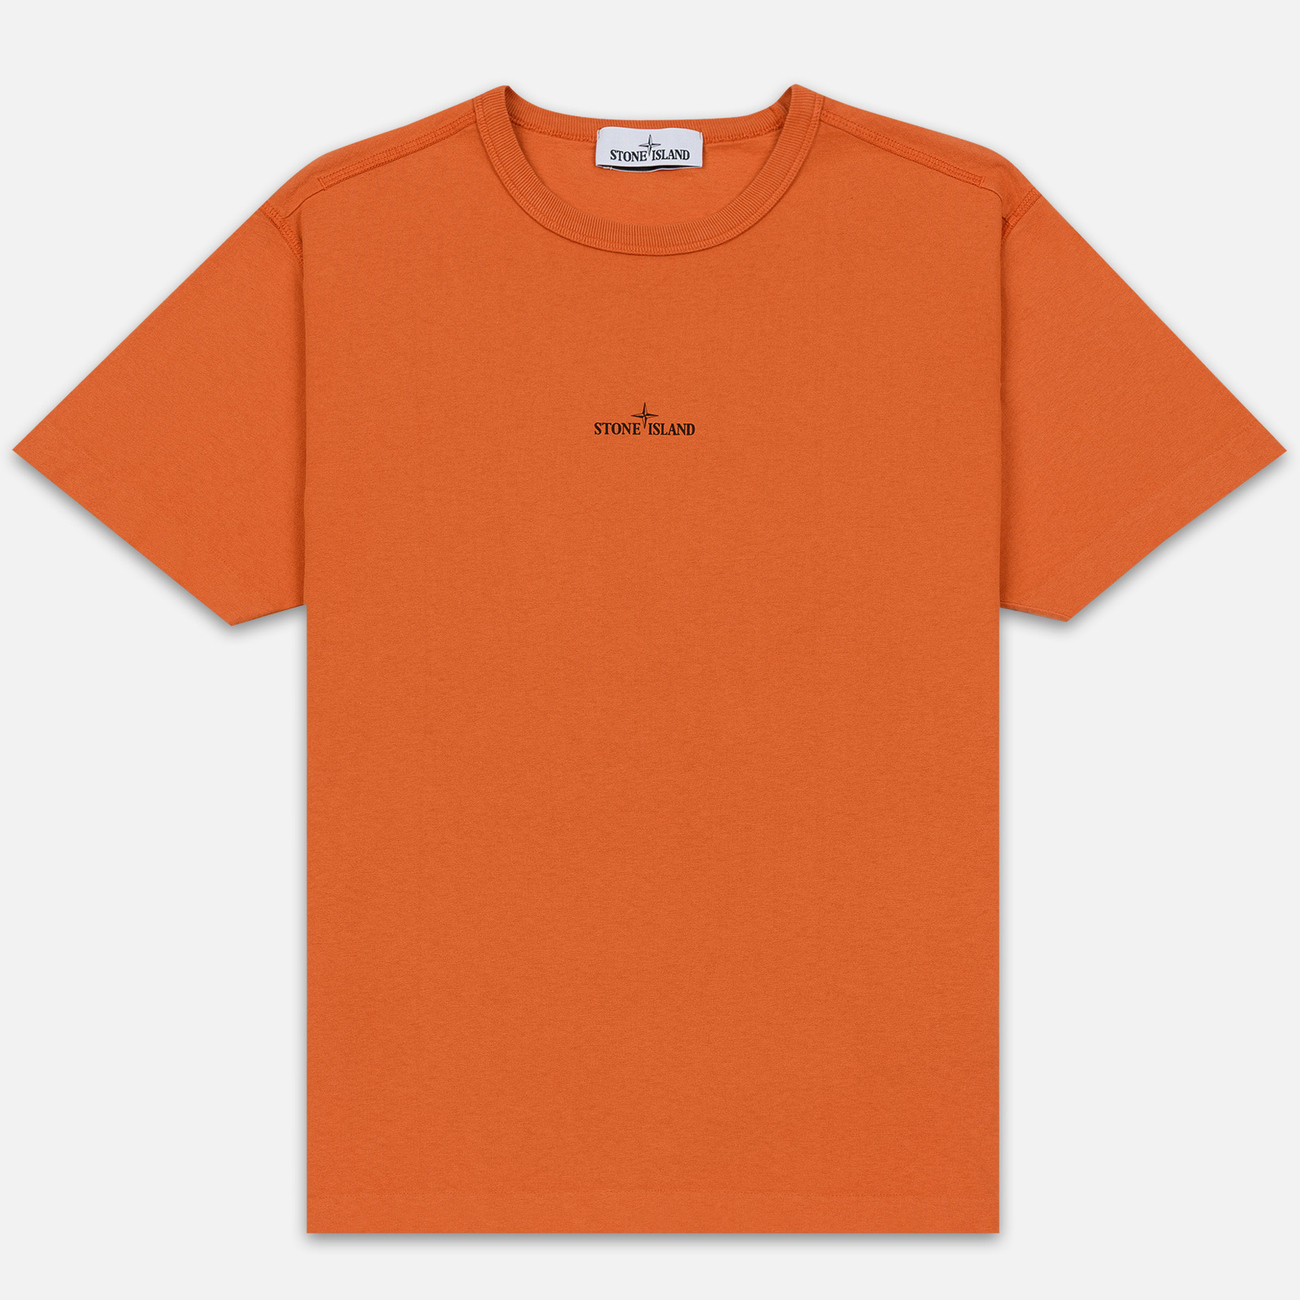 Мужская футболка Stone Island 7115 Graphic One Orange